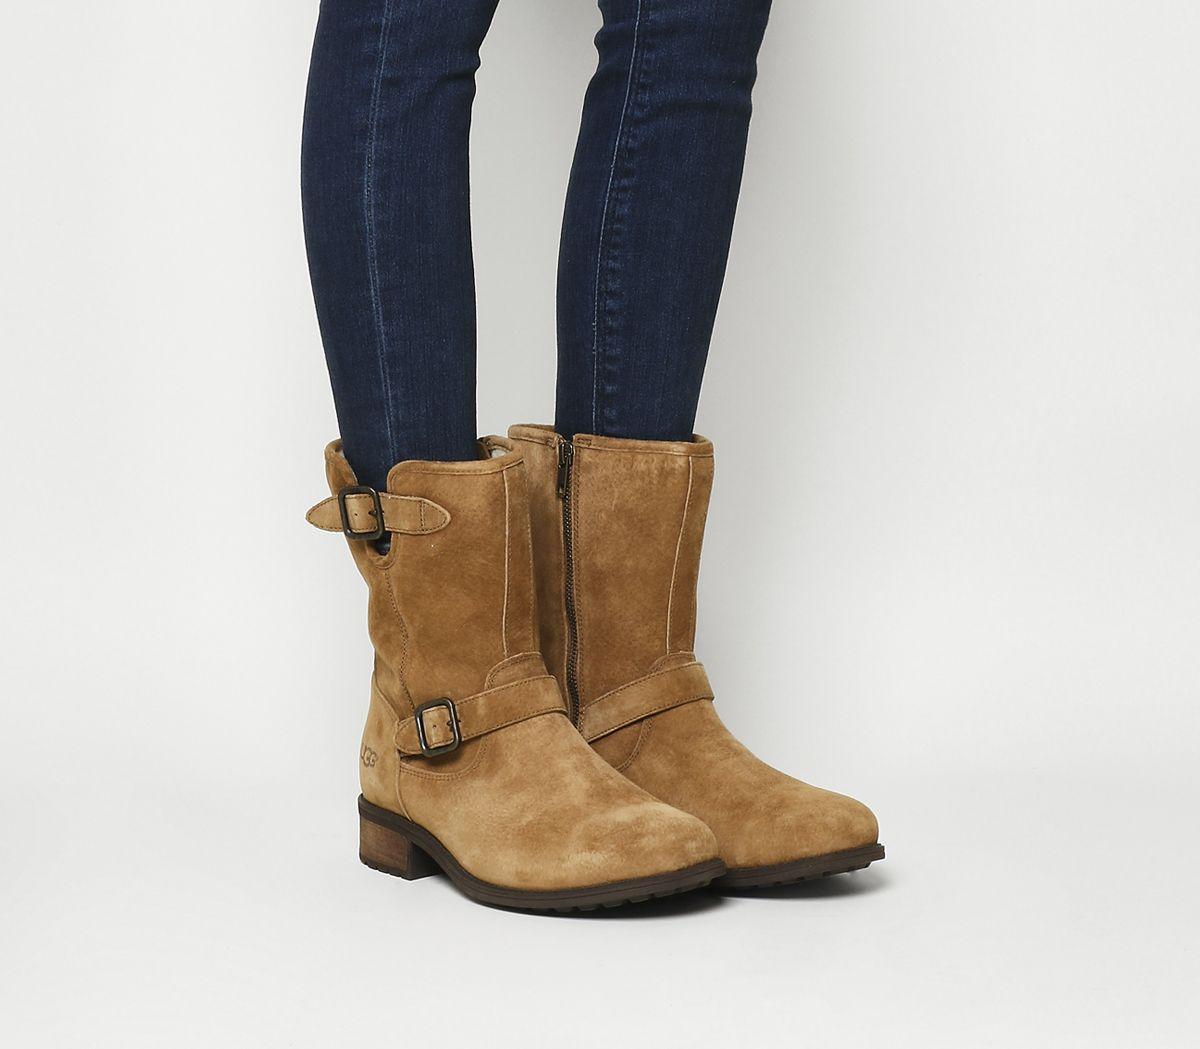 9a912eeeb2e Chaney Buckle Boots